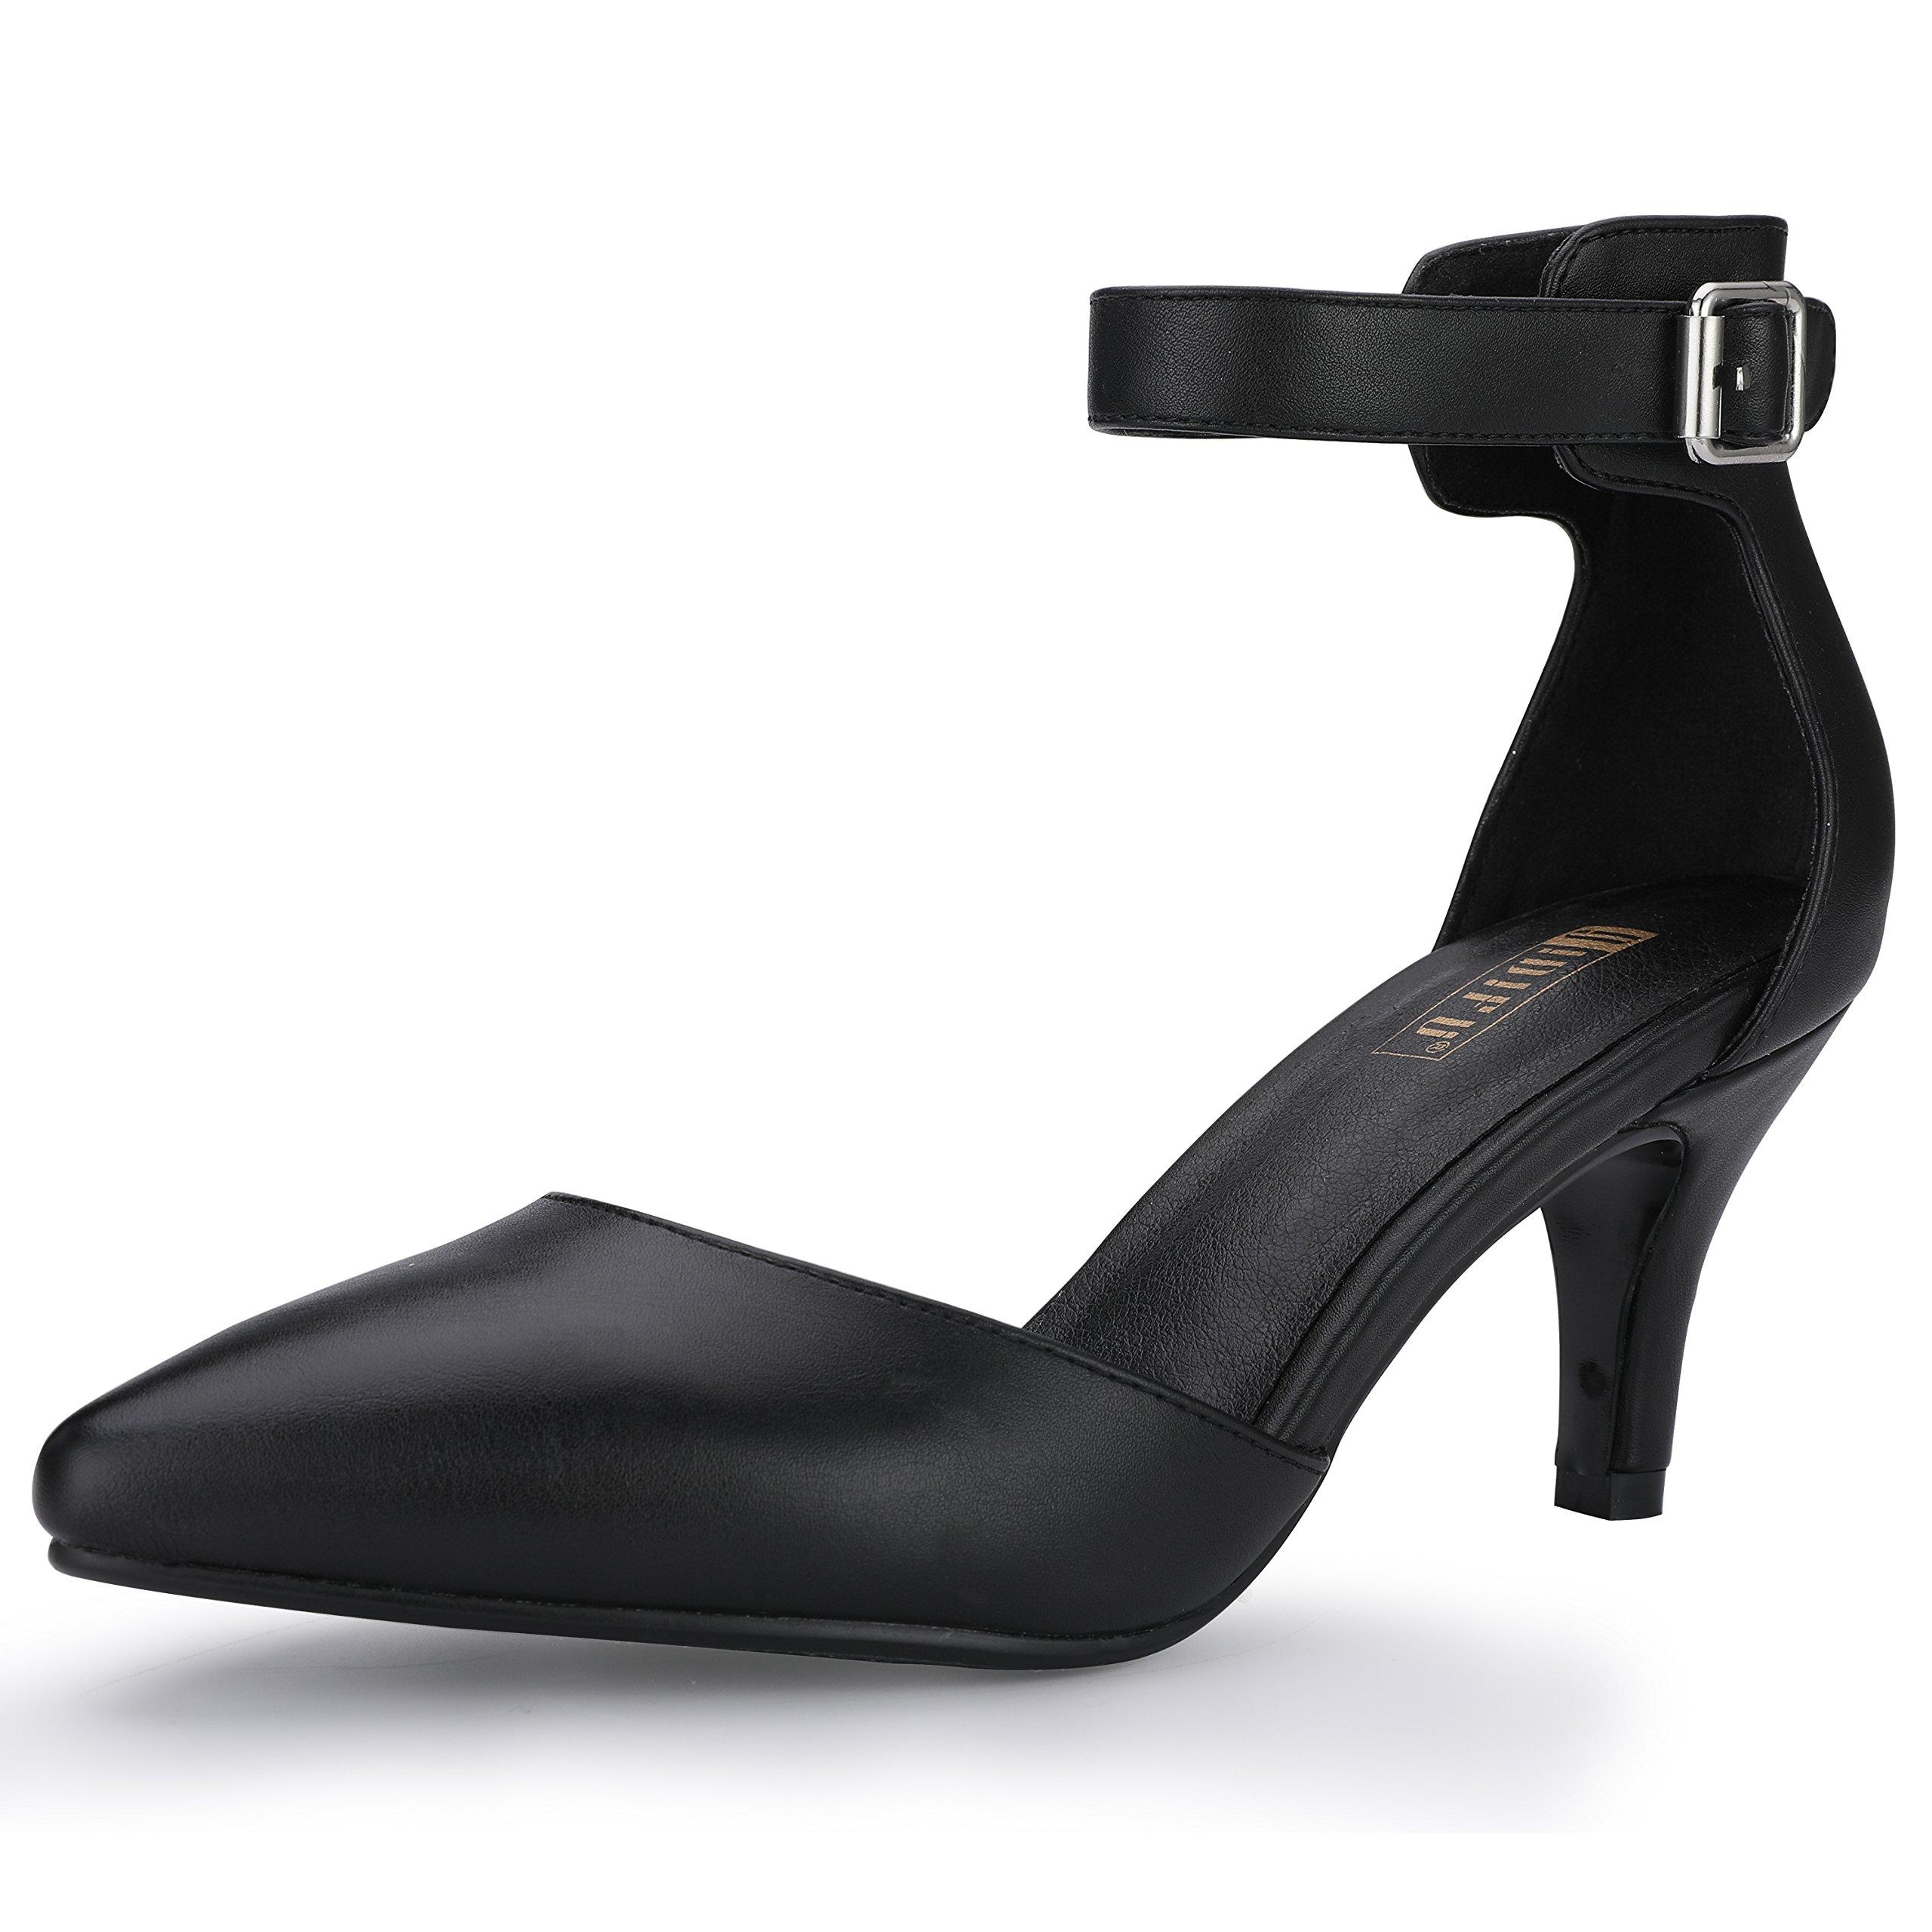 IDIFU Women's IN3 D'Orsay Pointed Toe Ankle Strap Mid Heel Pump (Black PU, 7 B(M) US)